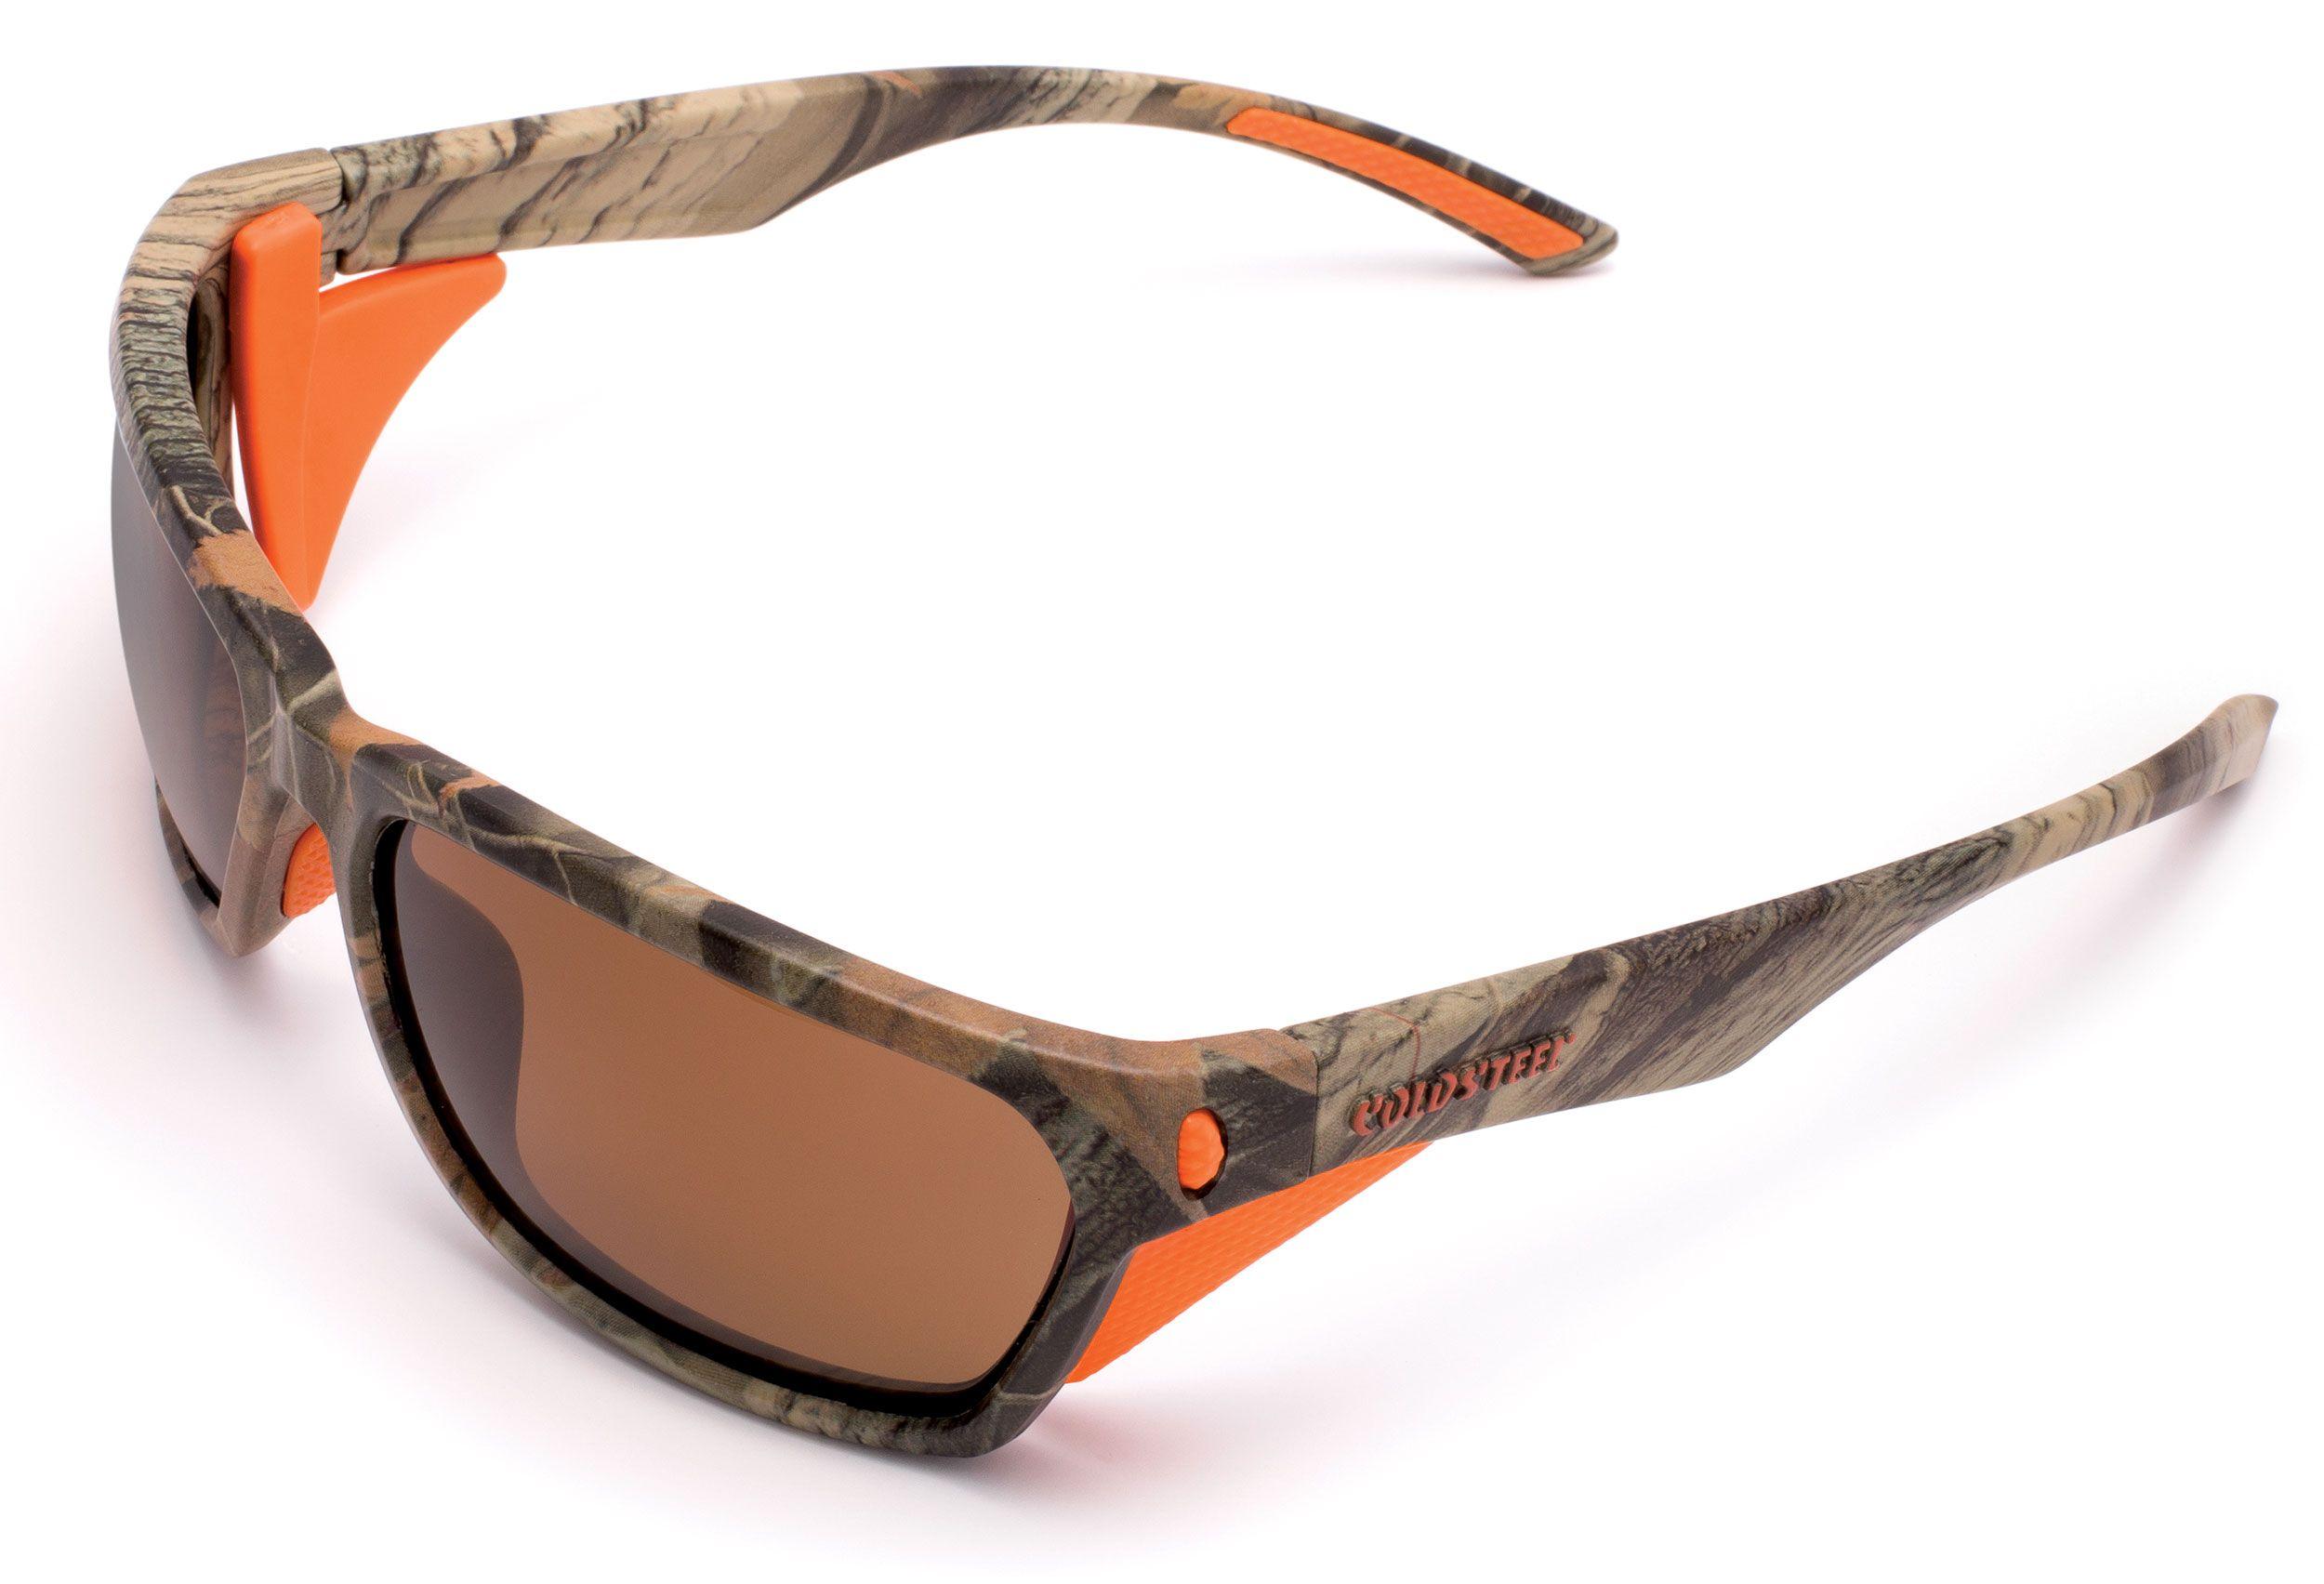 Cold Steel EW32P Battle Shades Mark-III Eyewear, Polarized, Camo Sunglasses